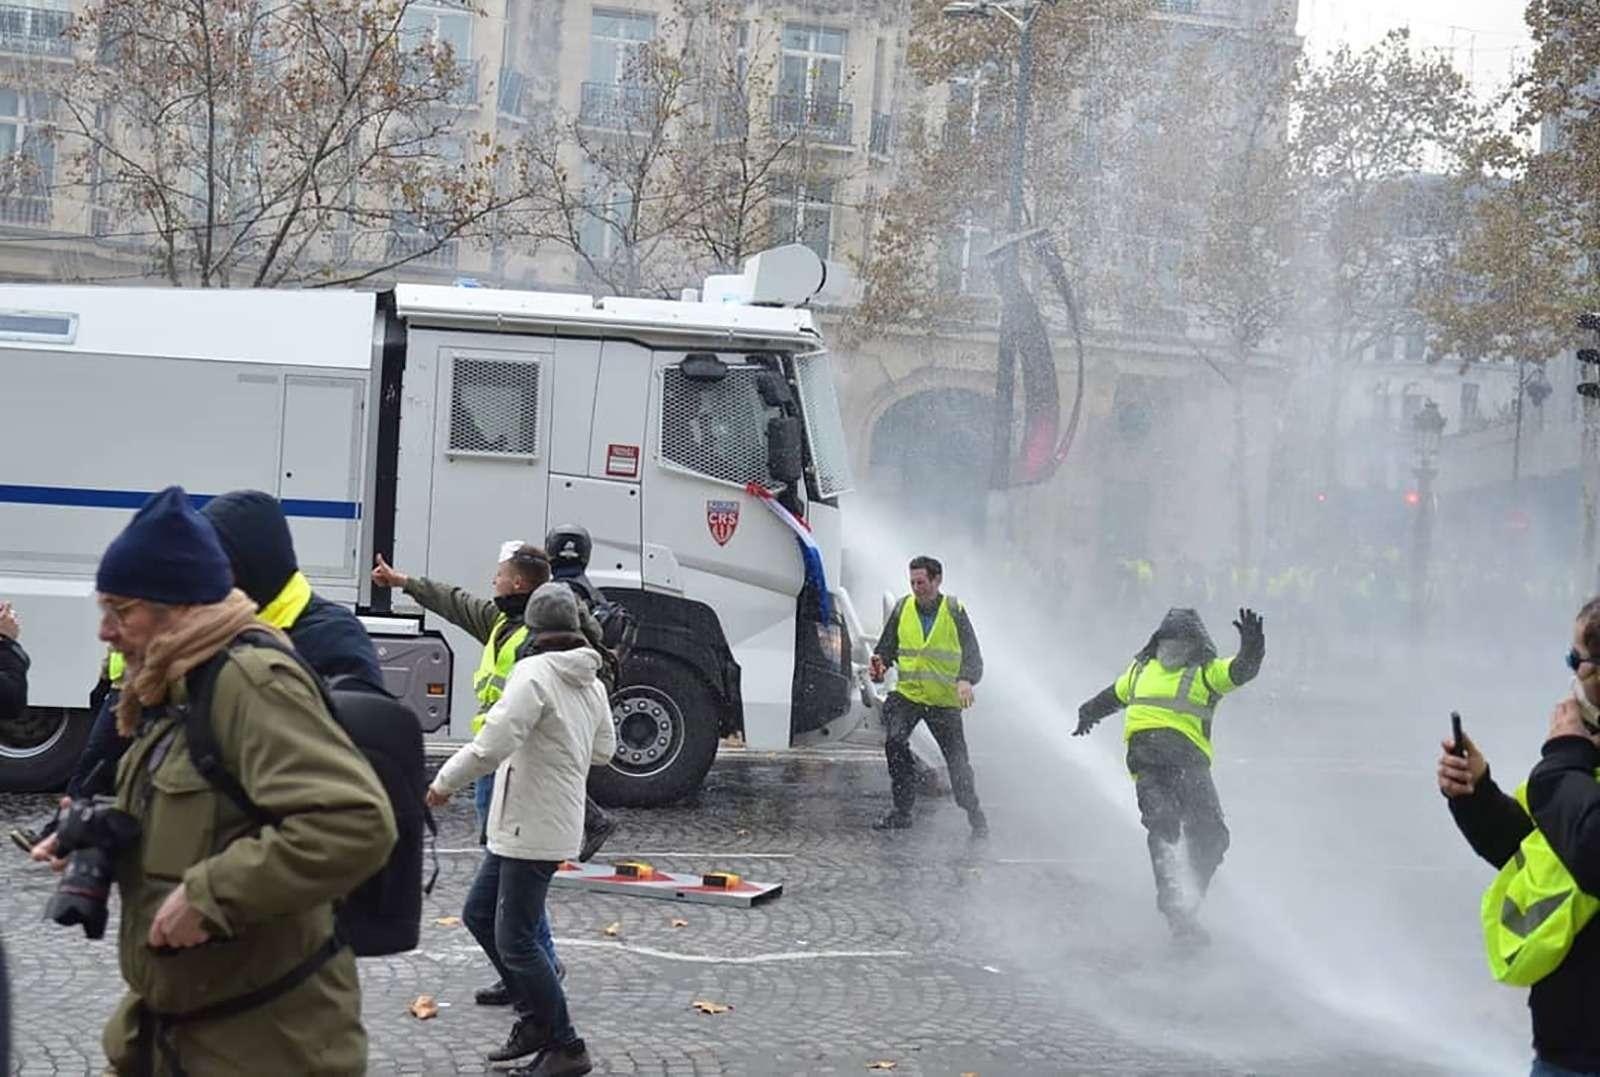 Какфранцузы протестуют против роста цен натопливо: баррикады против водометов— фото 926163